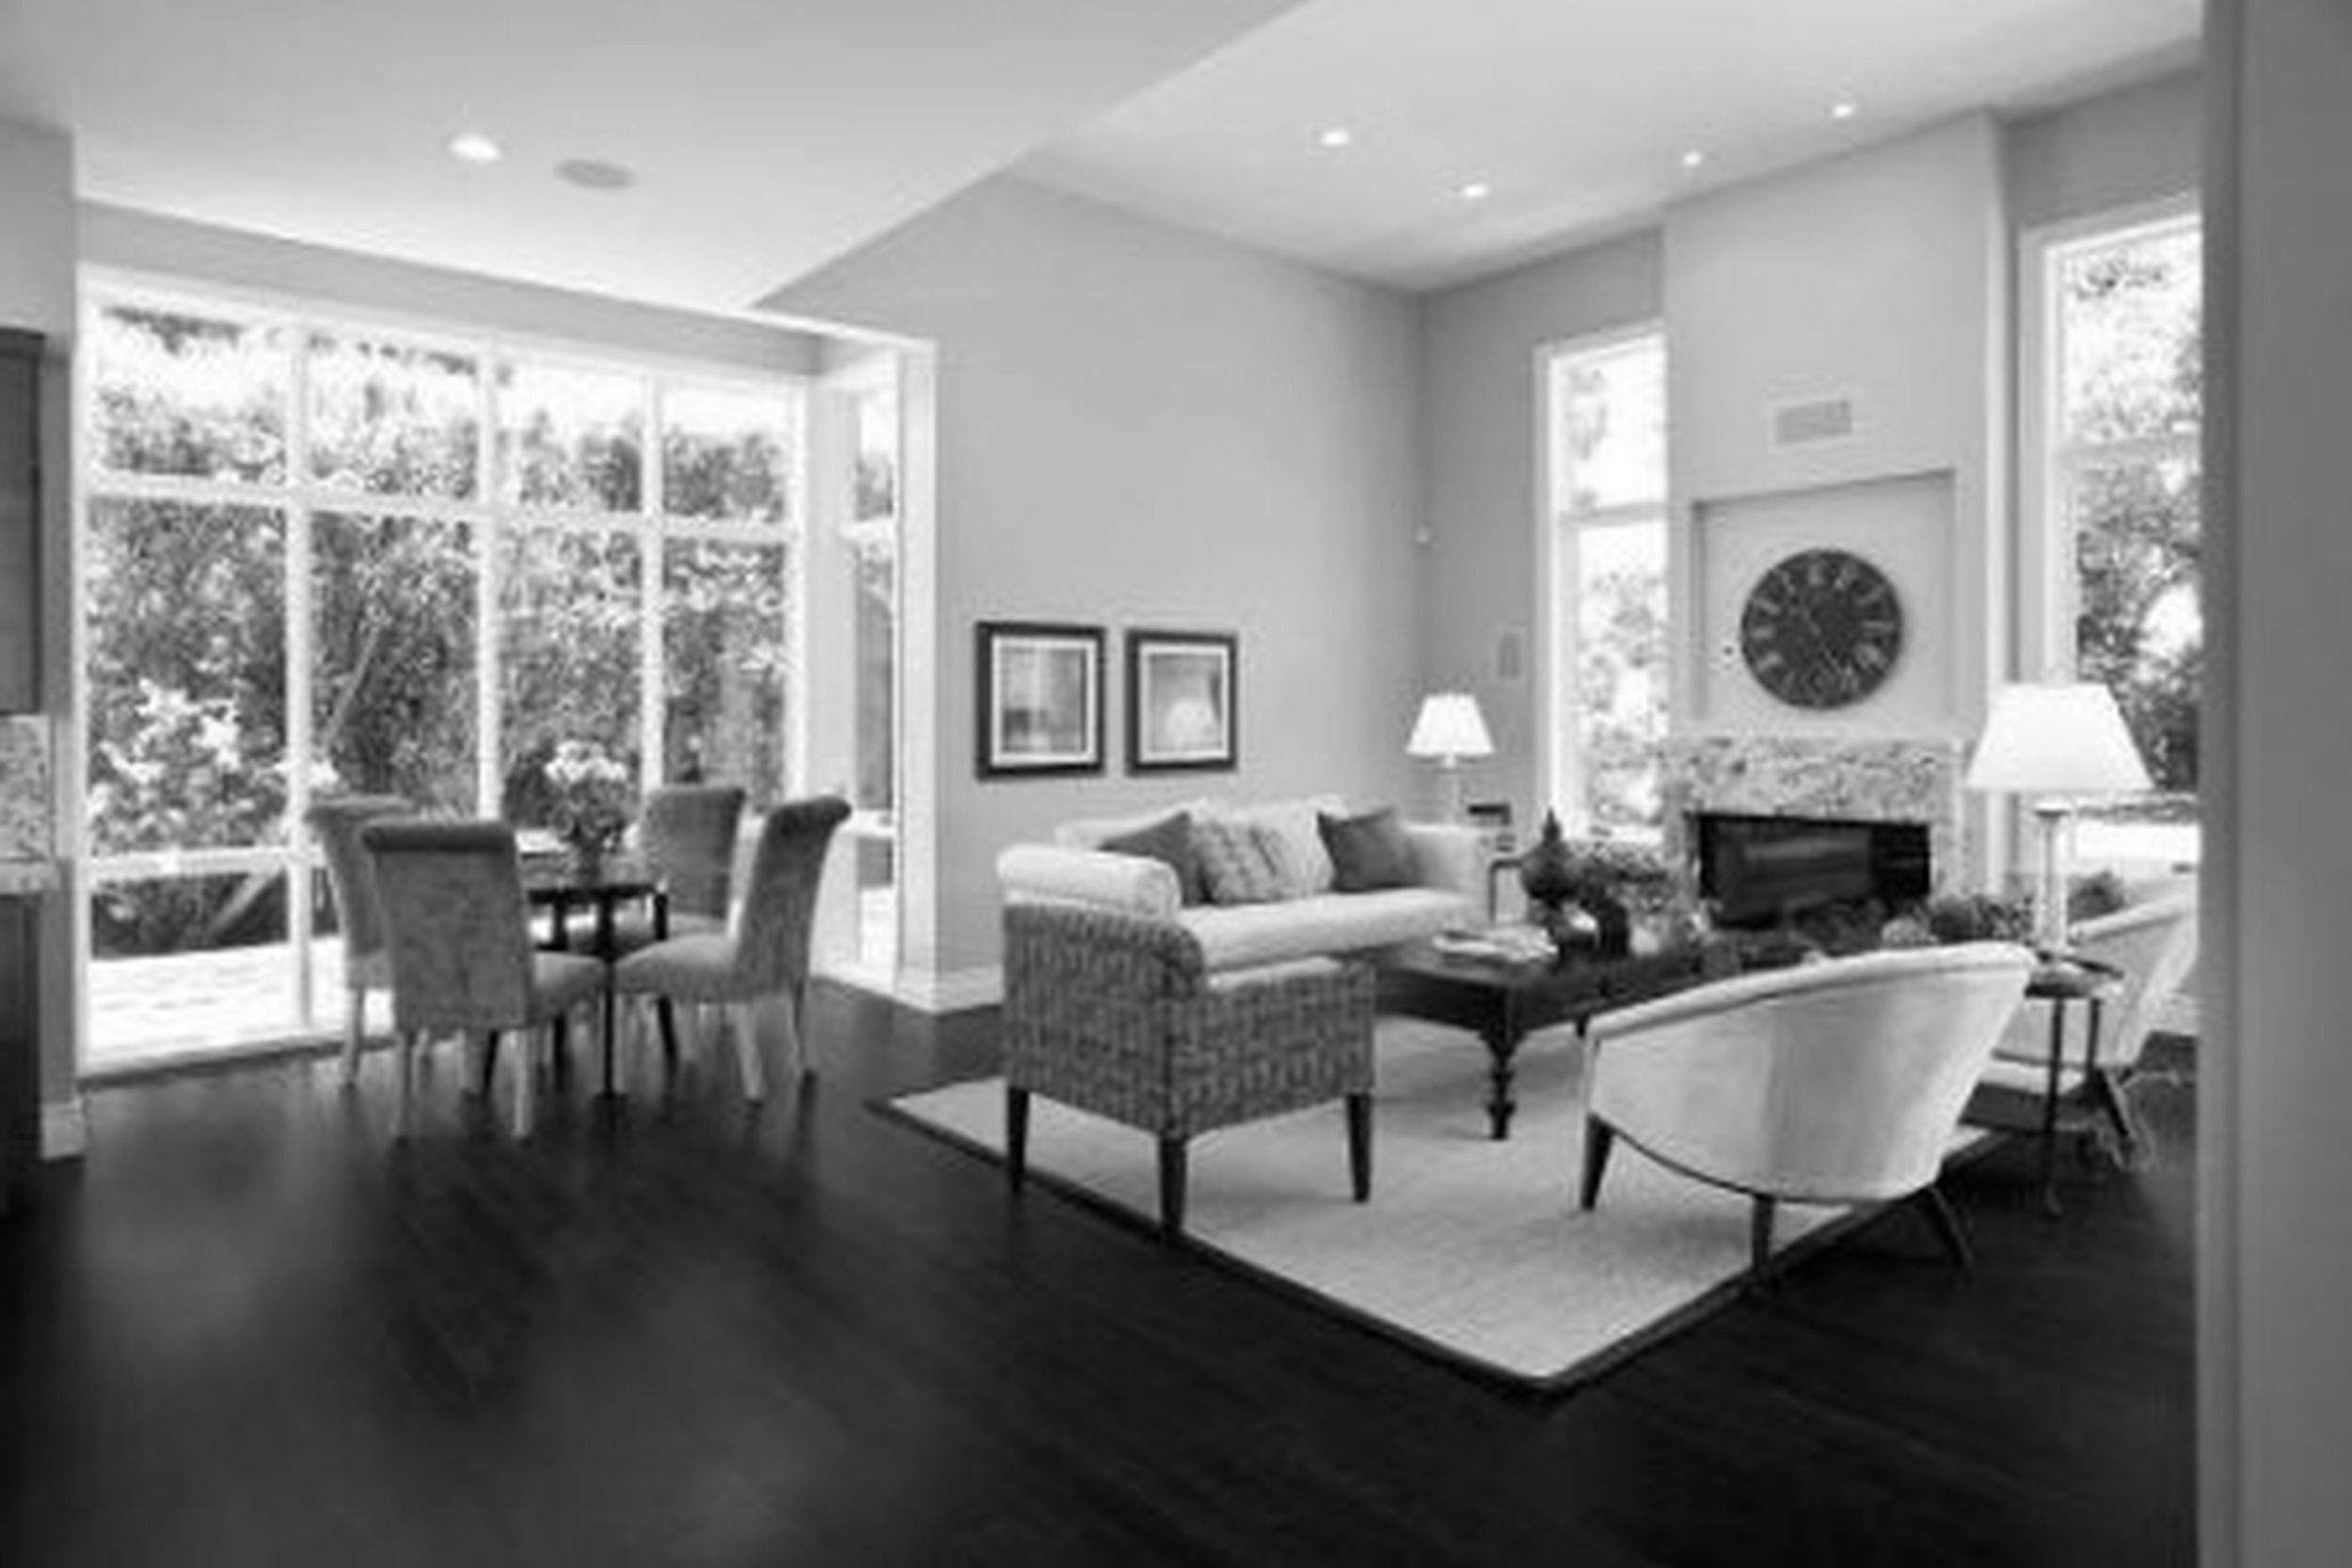 comely-modern-living-room-ideas-ovation-hot-living-room.jpg